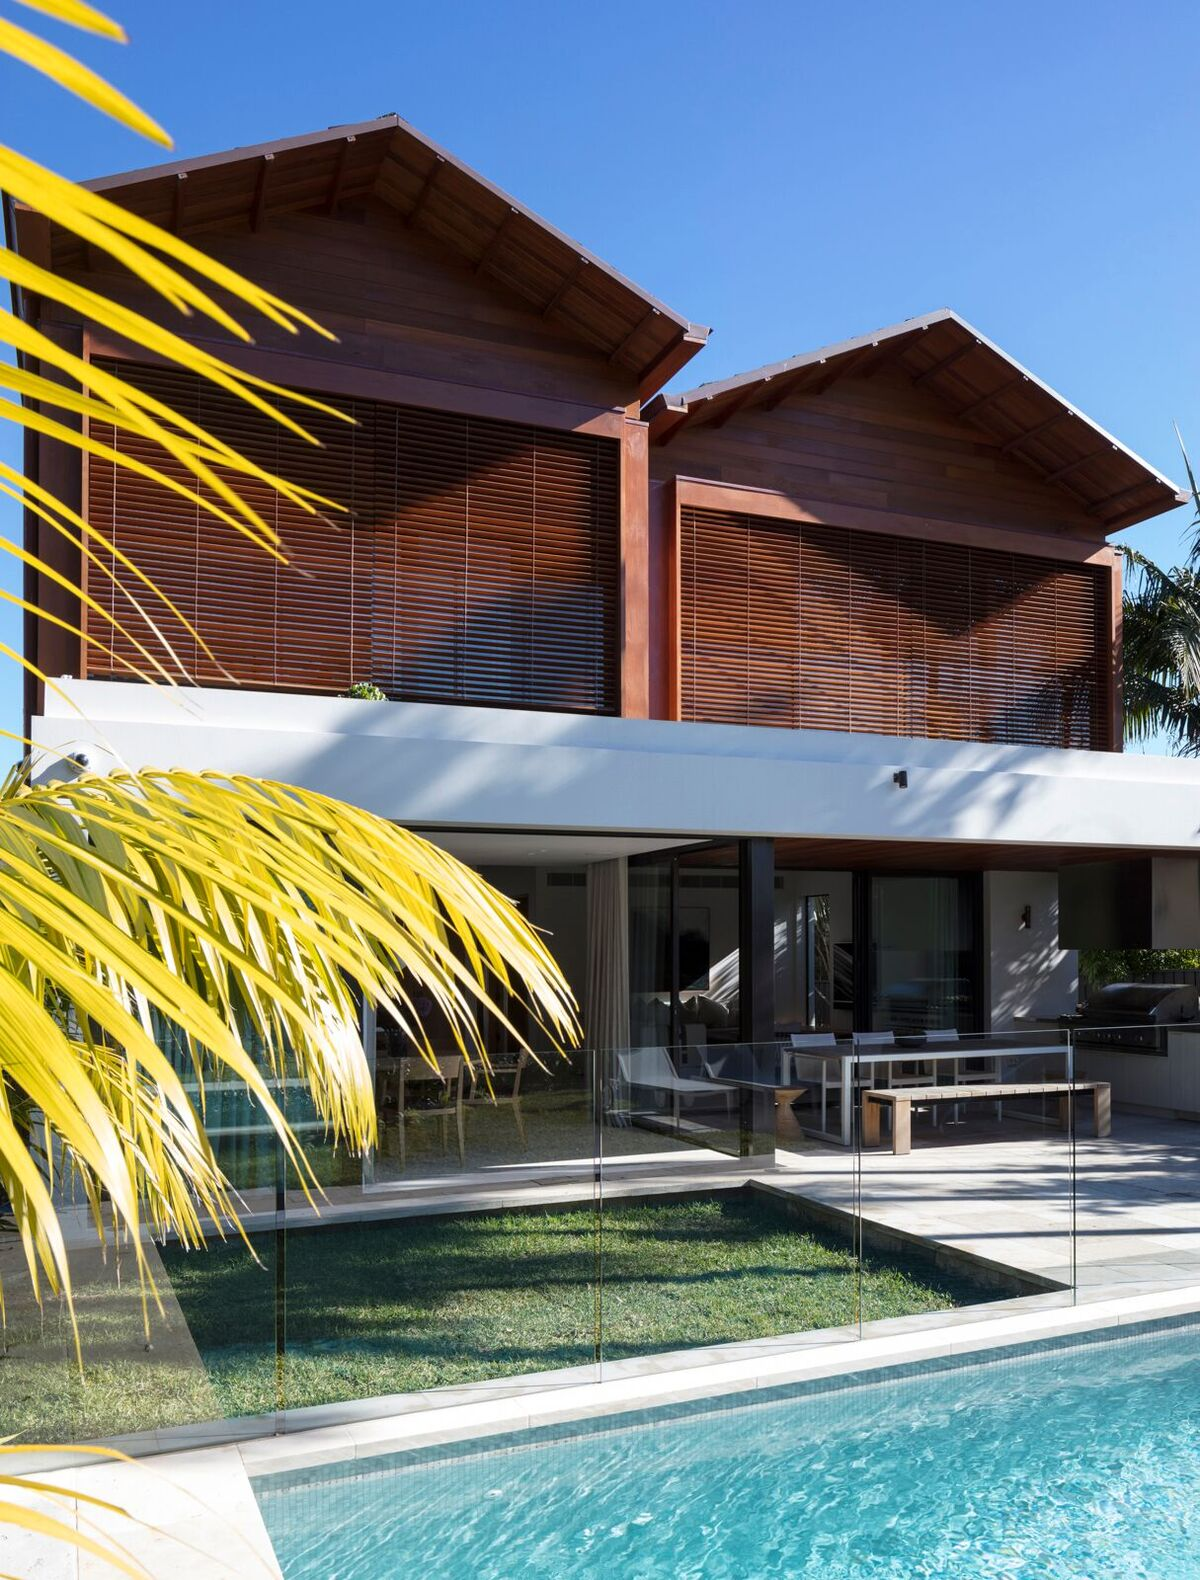 Gallery Of Methuen Residence By Daniel Boddam Local Australian Architecture Interiors And Bespoke Design Mosman, Sydney Image 27